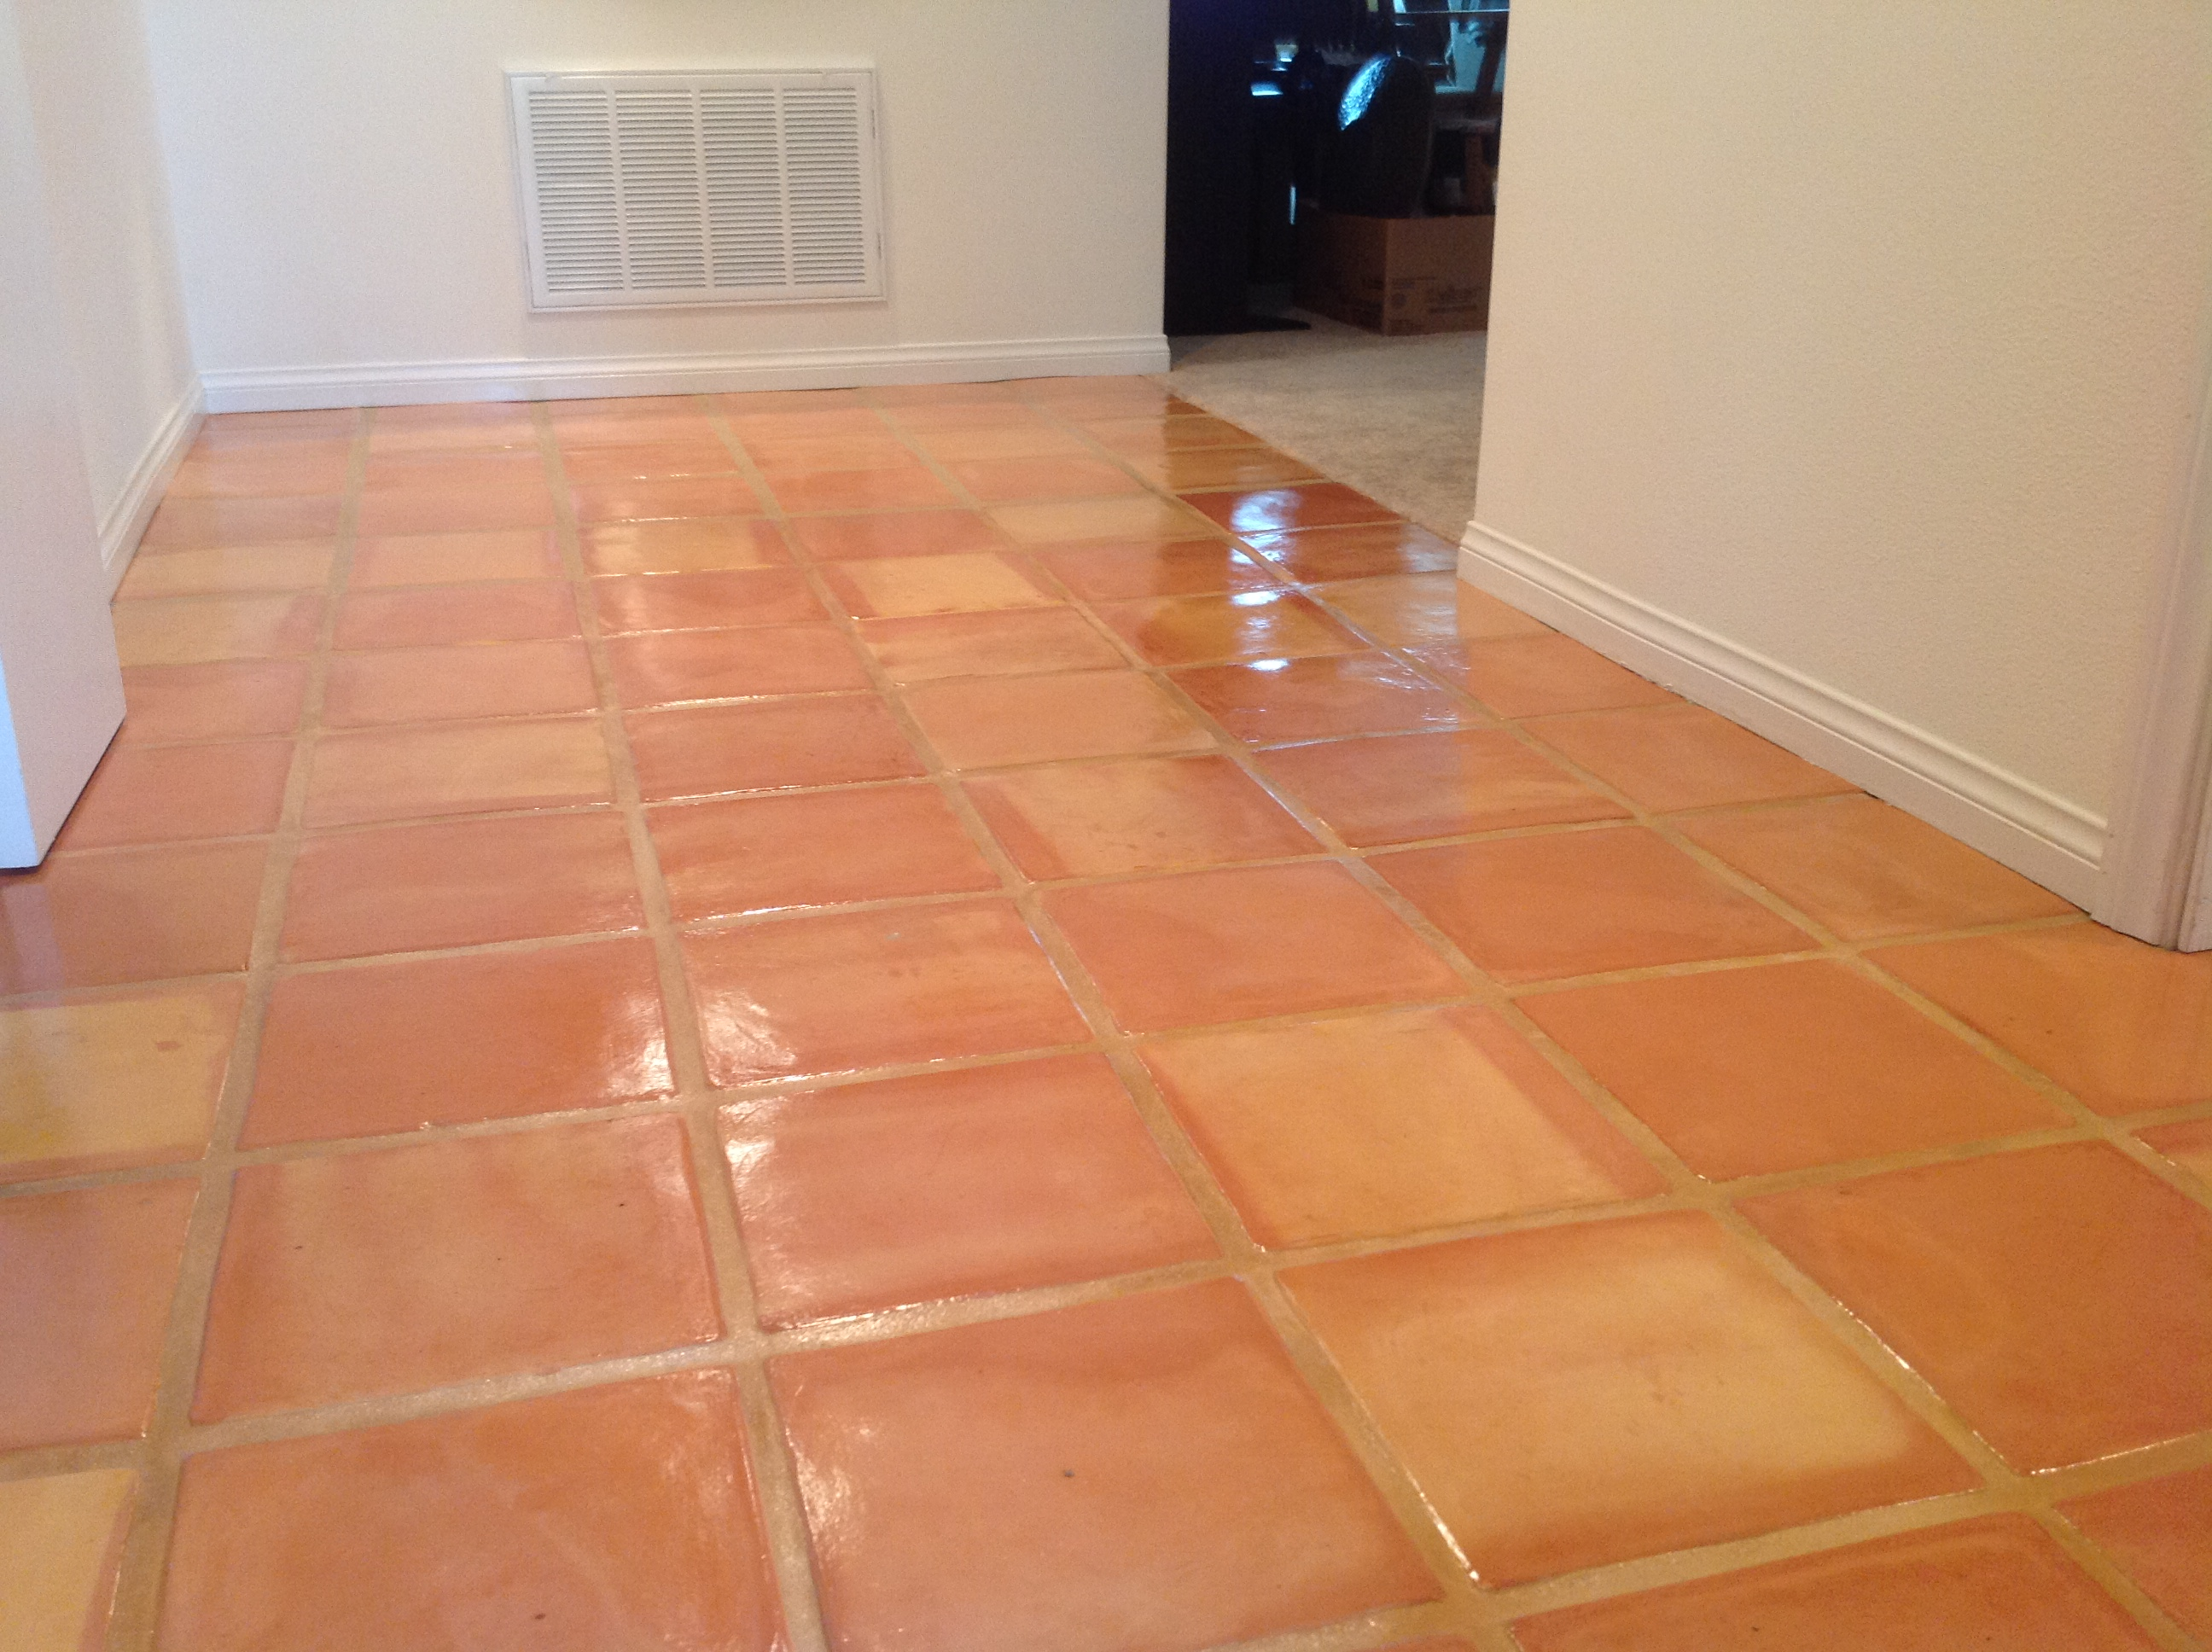 Fine 2 X 4 Ceiling Tiles Huge 200X200 Floor Tiles Flat 2X2 Ceramic Floor Tile 2X2 Drop Ceiling Tiles Young 3D Ceiling Tiles Pink4 X 12 Subway Tile Saltillo Tile Dirty, Peeling, Dull? California Tile Refinishing